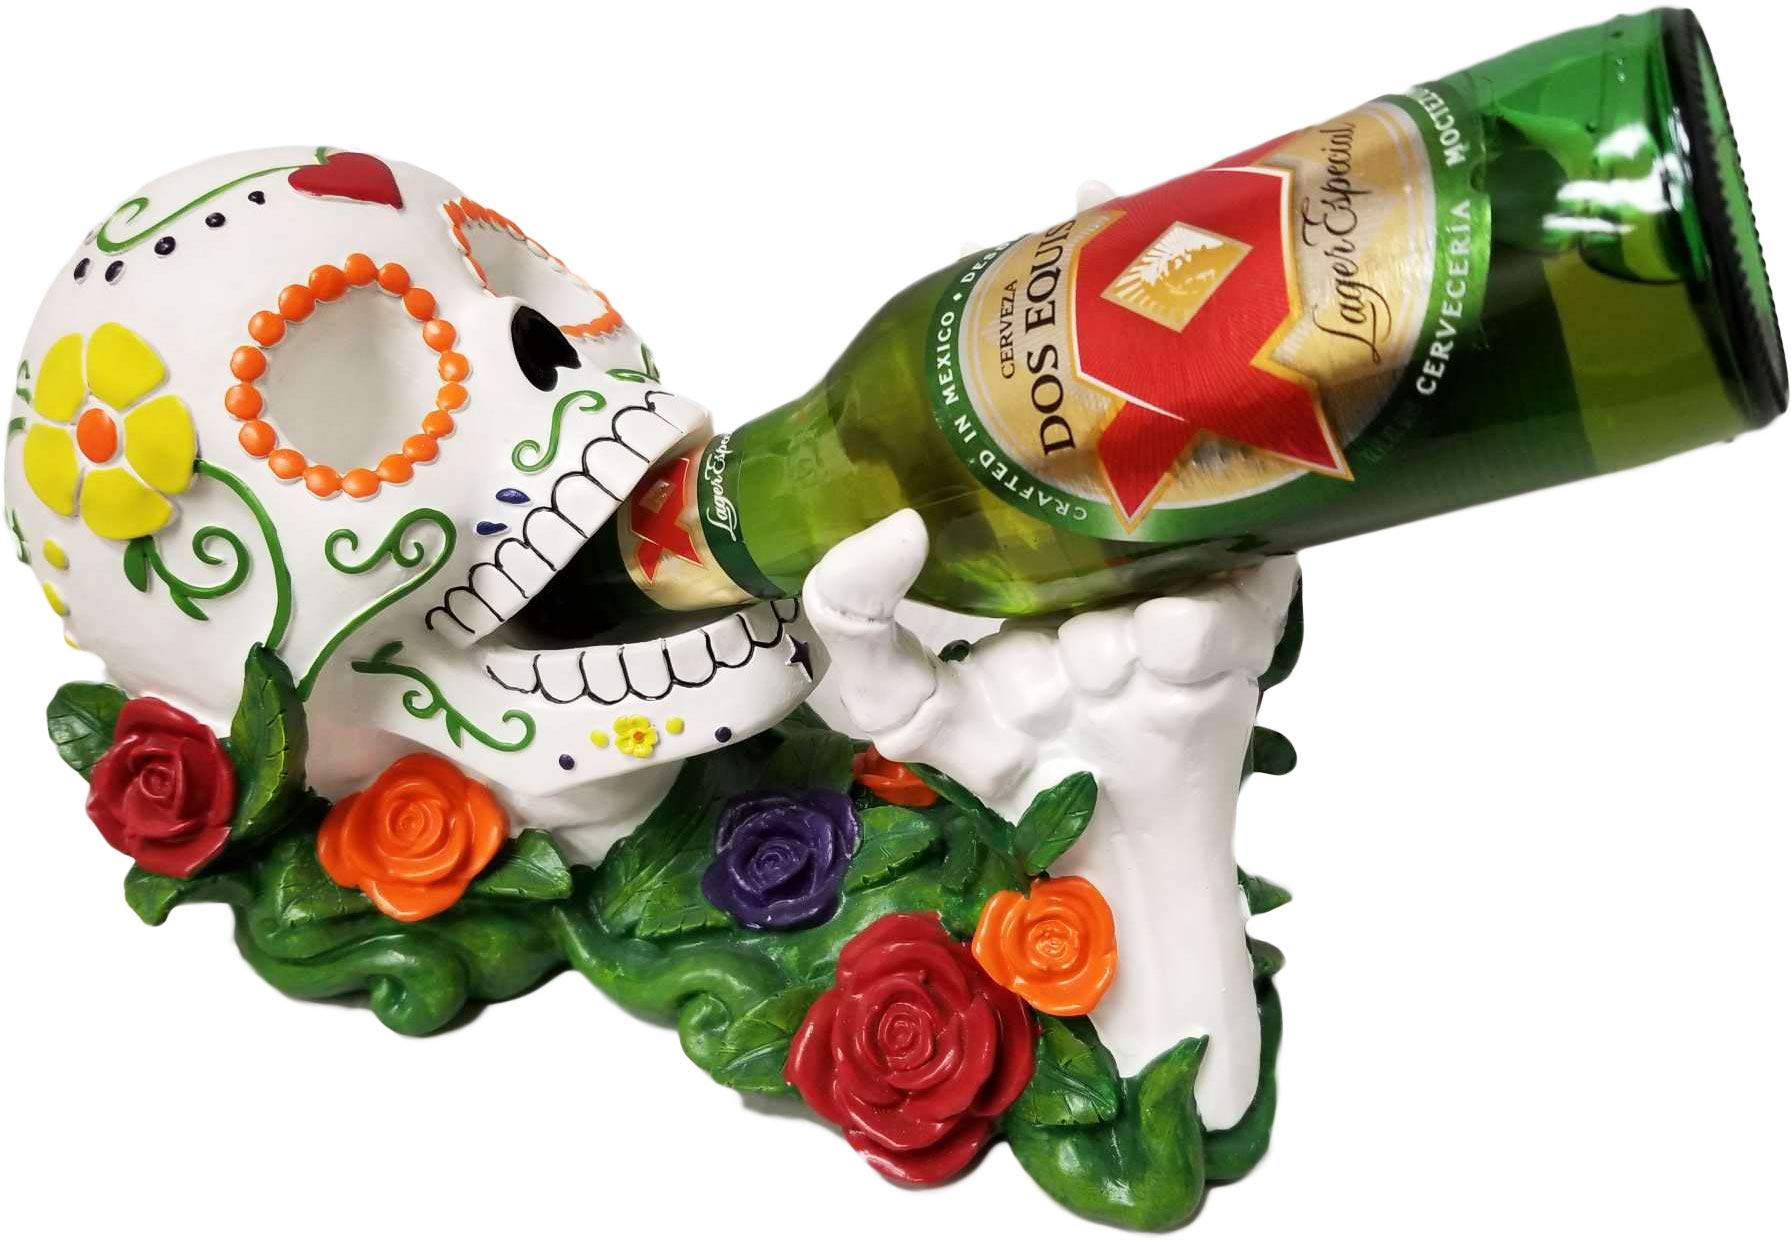 DWK 11.5'' Vin Los Muertos Day of the Dead Sugar Skull Wine Beer Bottle Holder Statue Decor by DWK Corporation